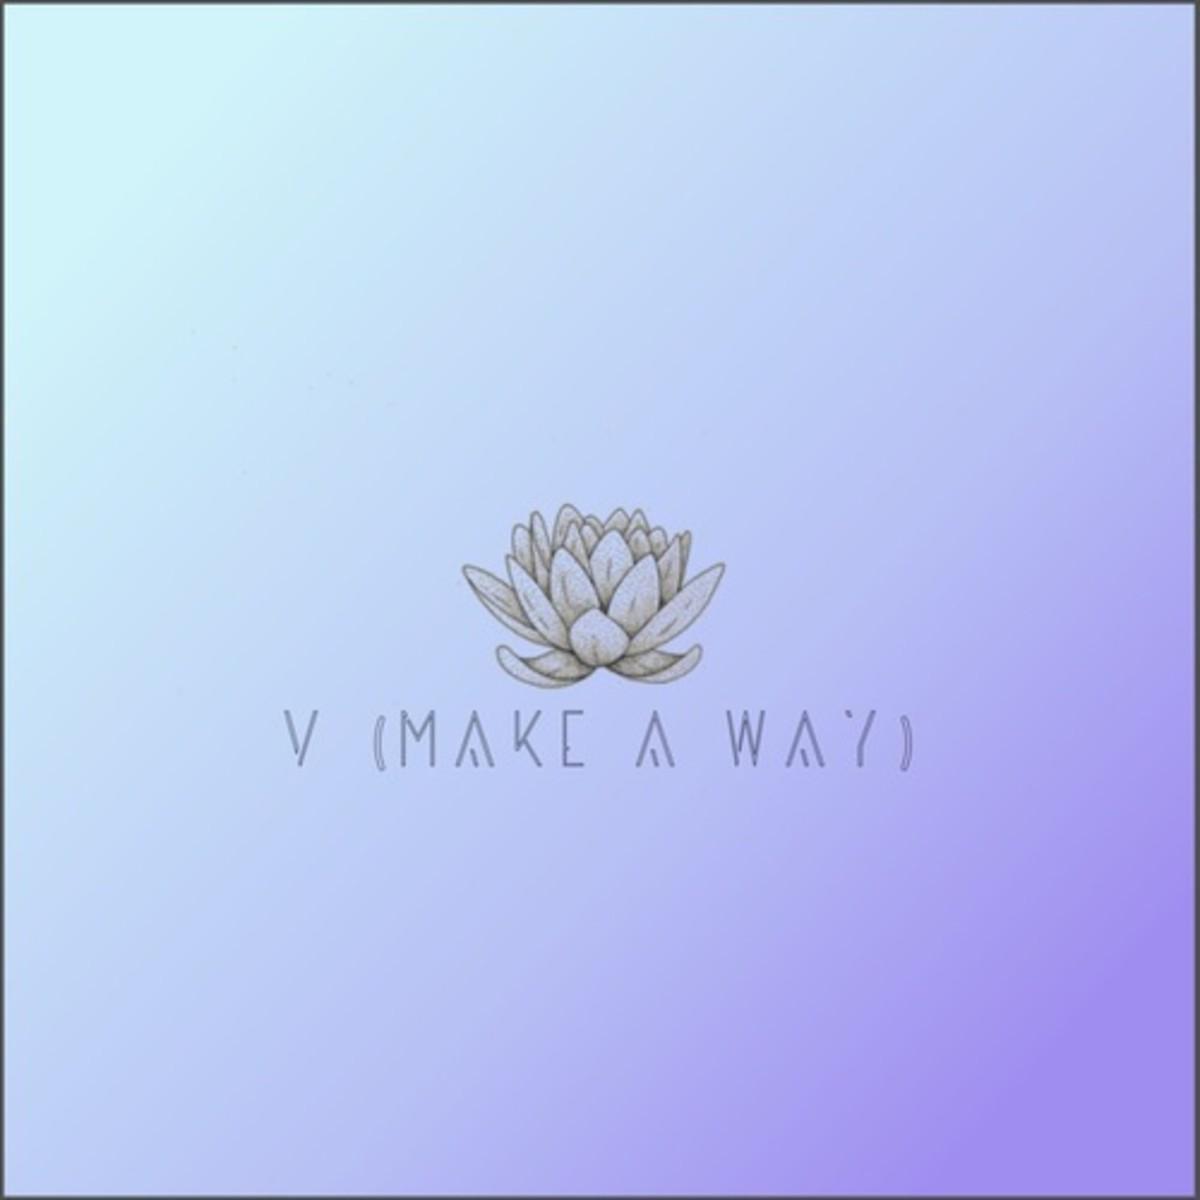 visionnaire-v-make-a-way.JPG